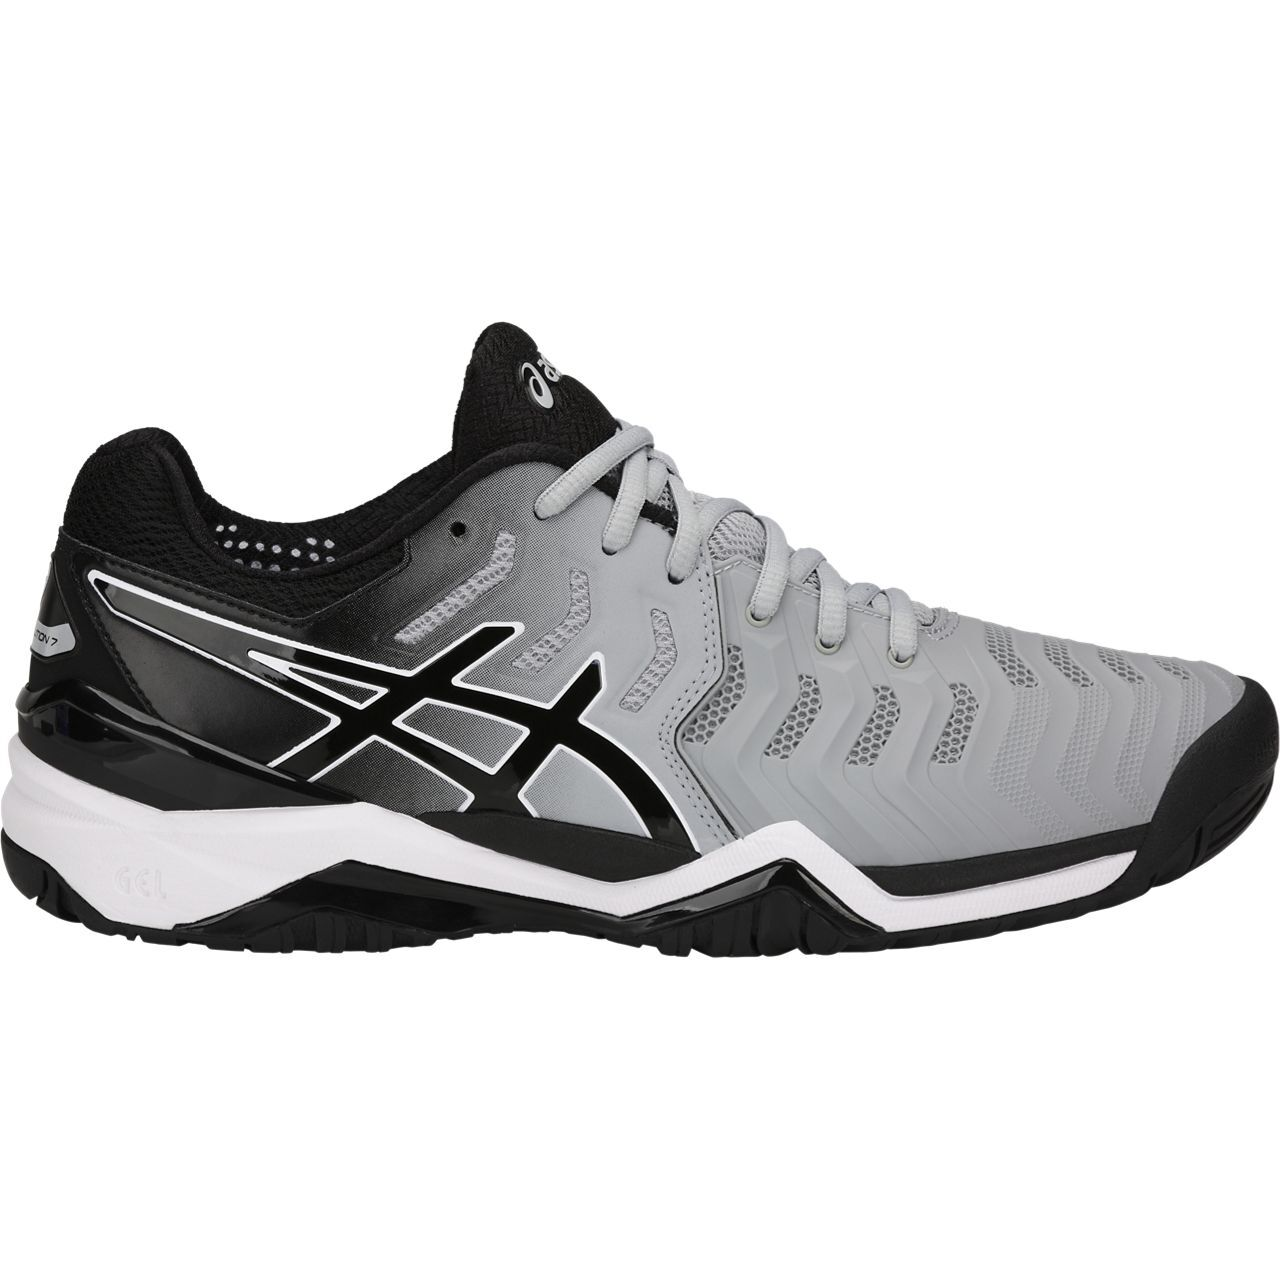 asics gel-game 7 men's tennis shoe quotes